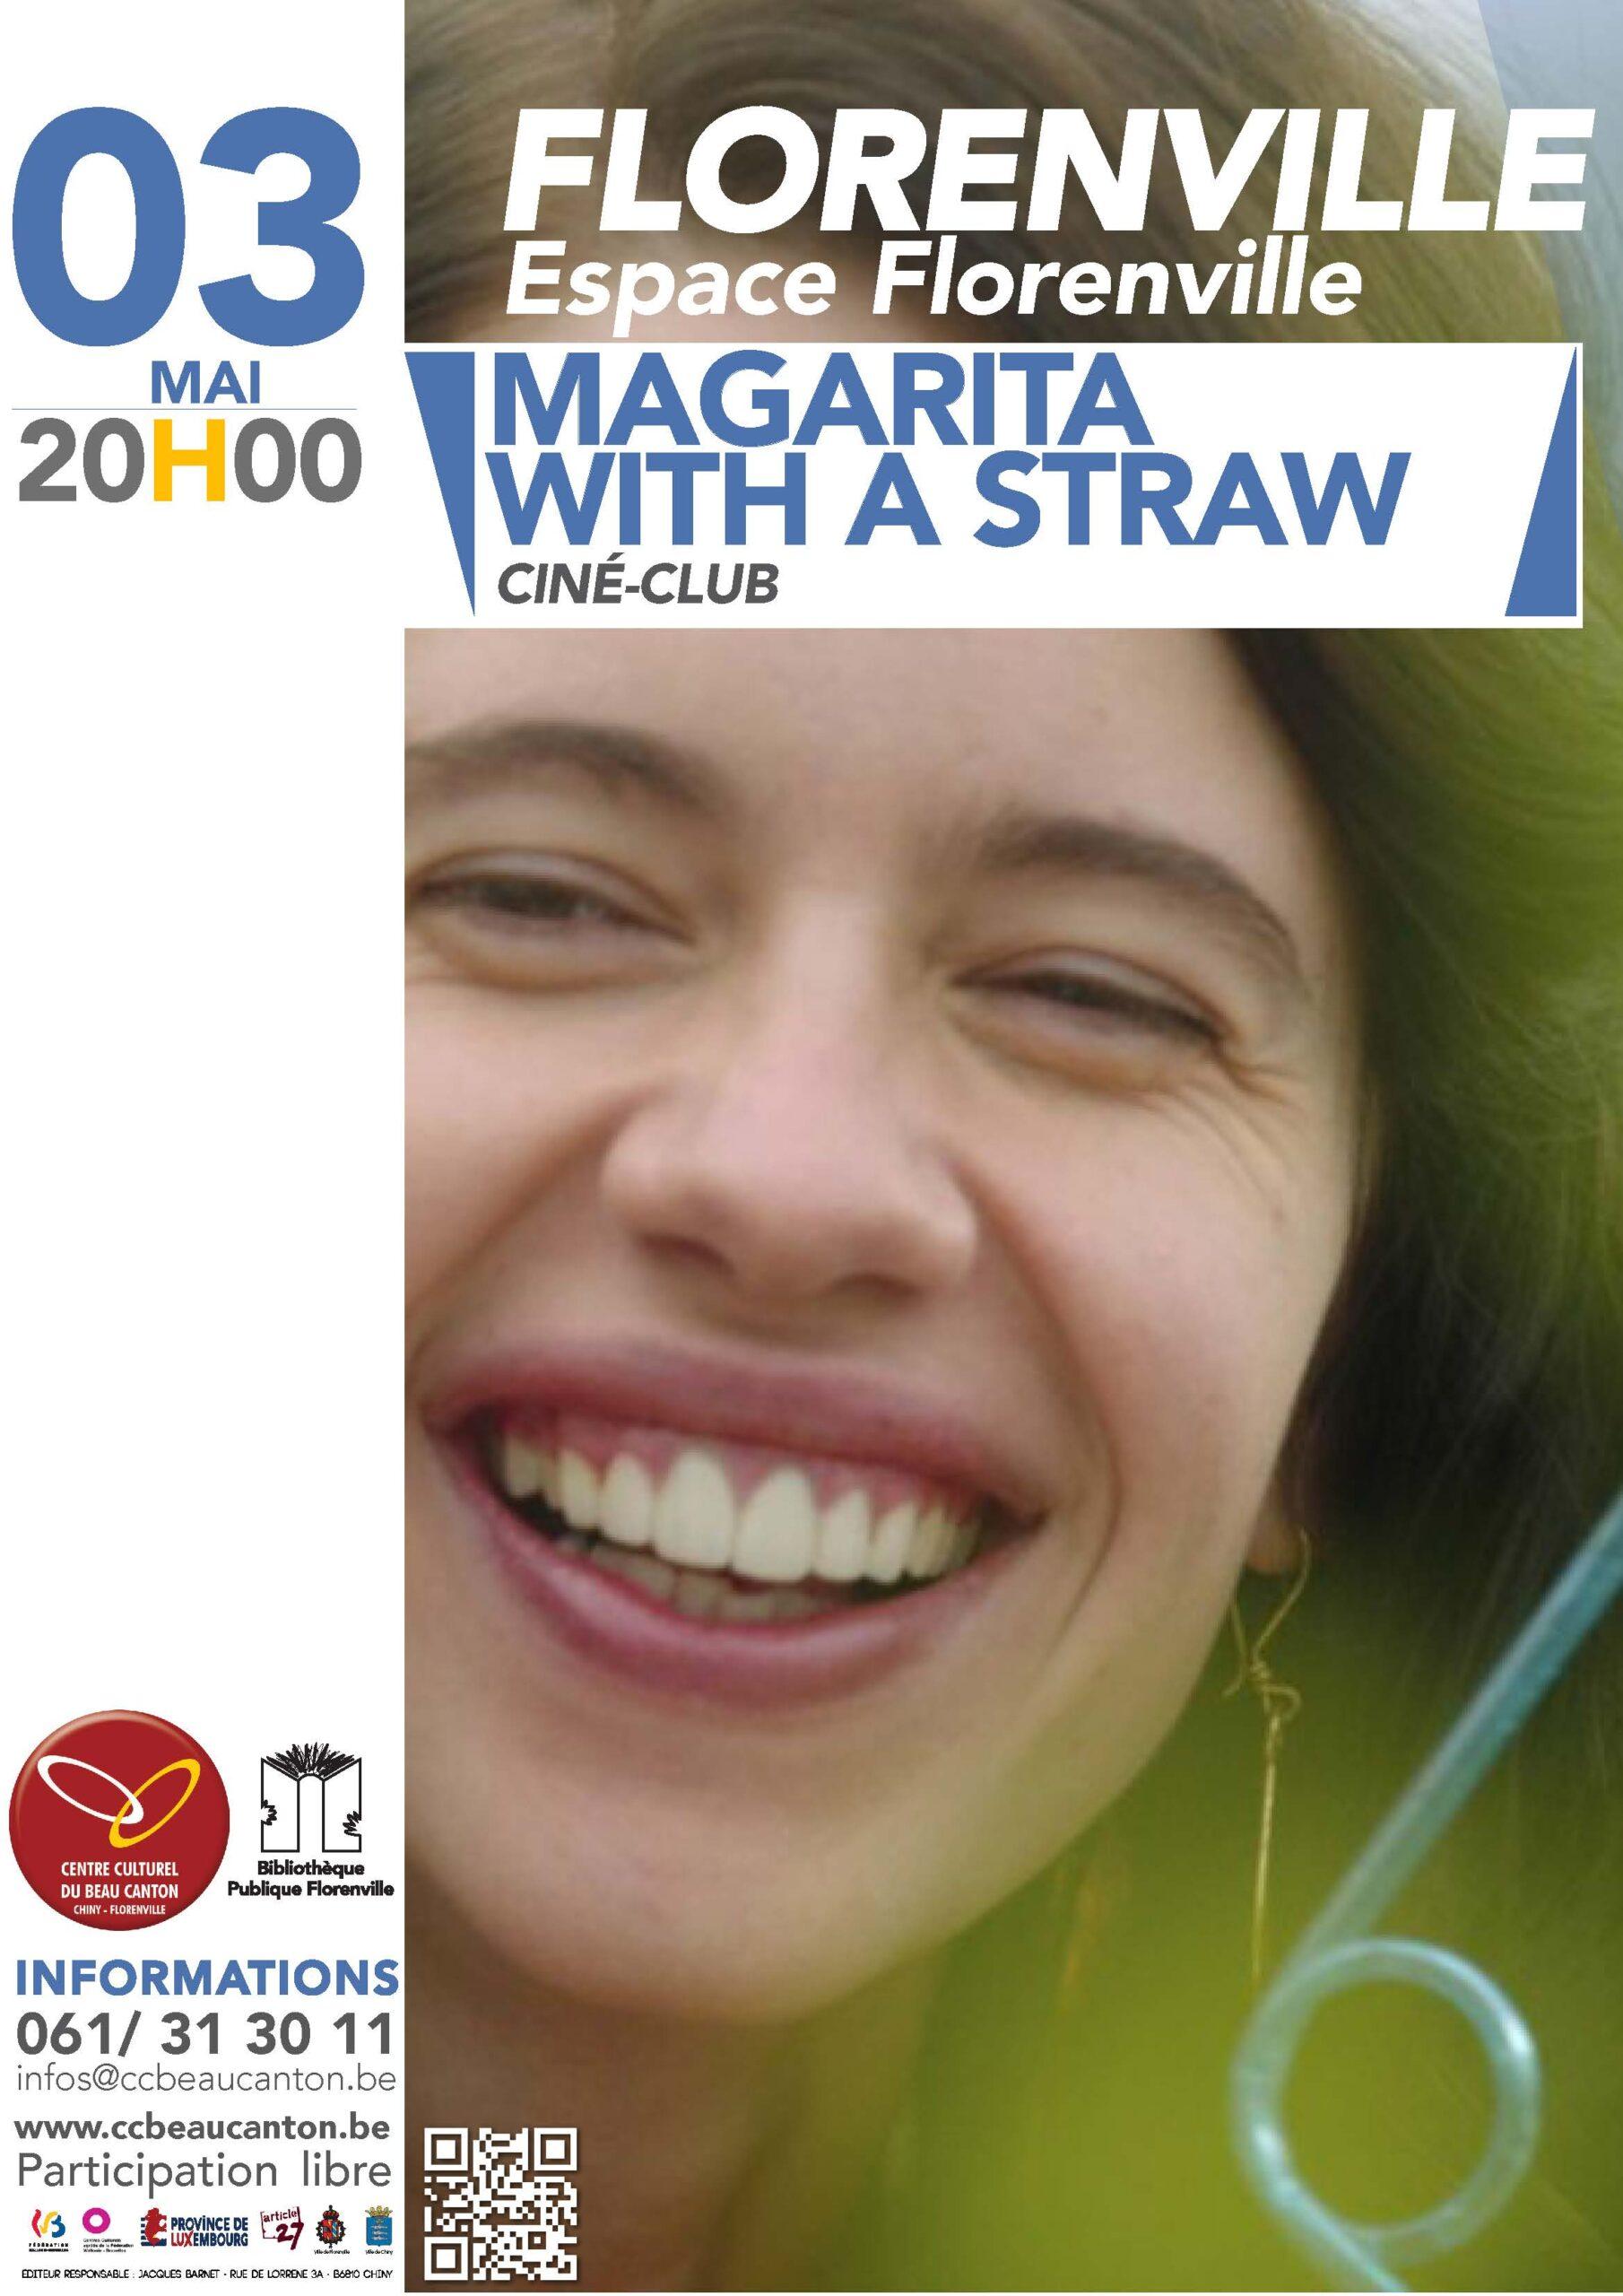 CINE-CLUB : MAGARITA IN THE STRAW – L'amour malgré le handicap à Florenville